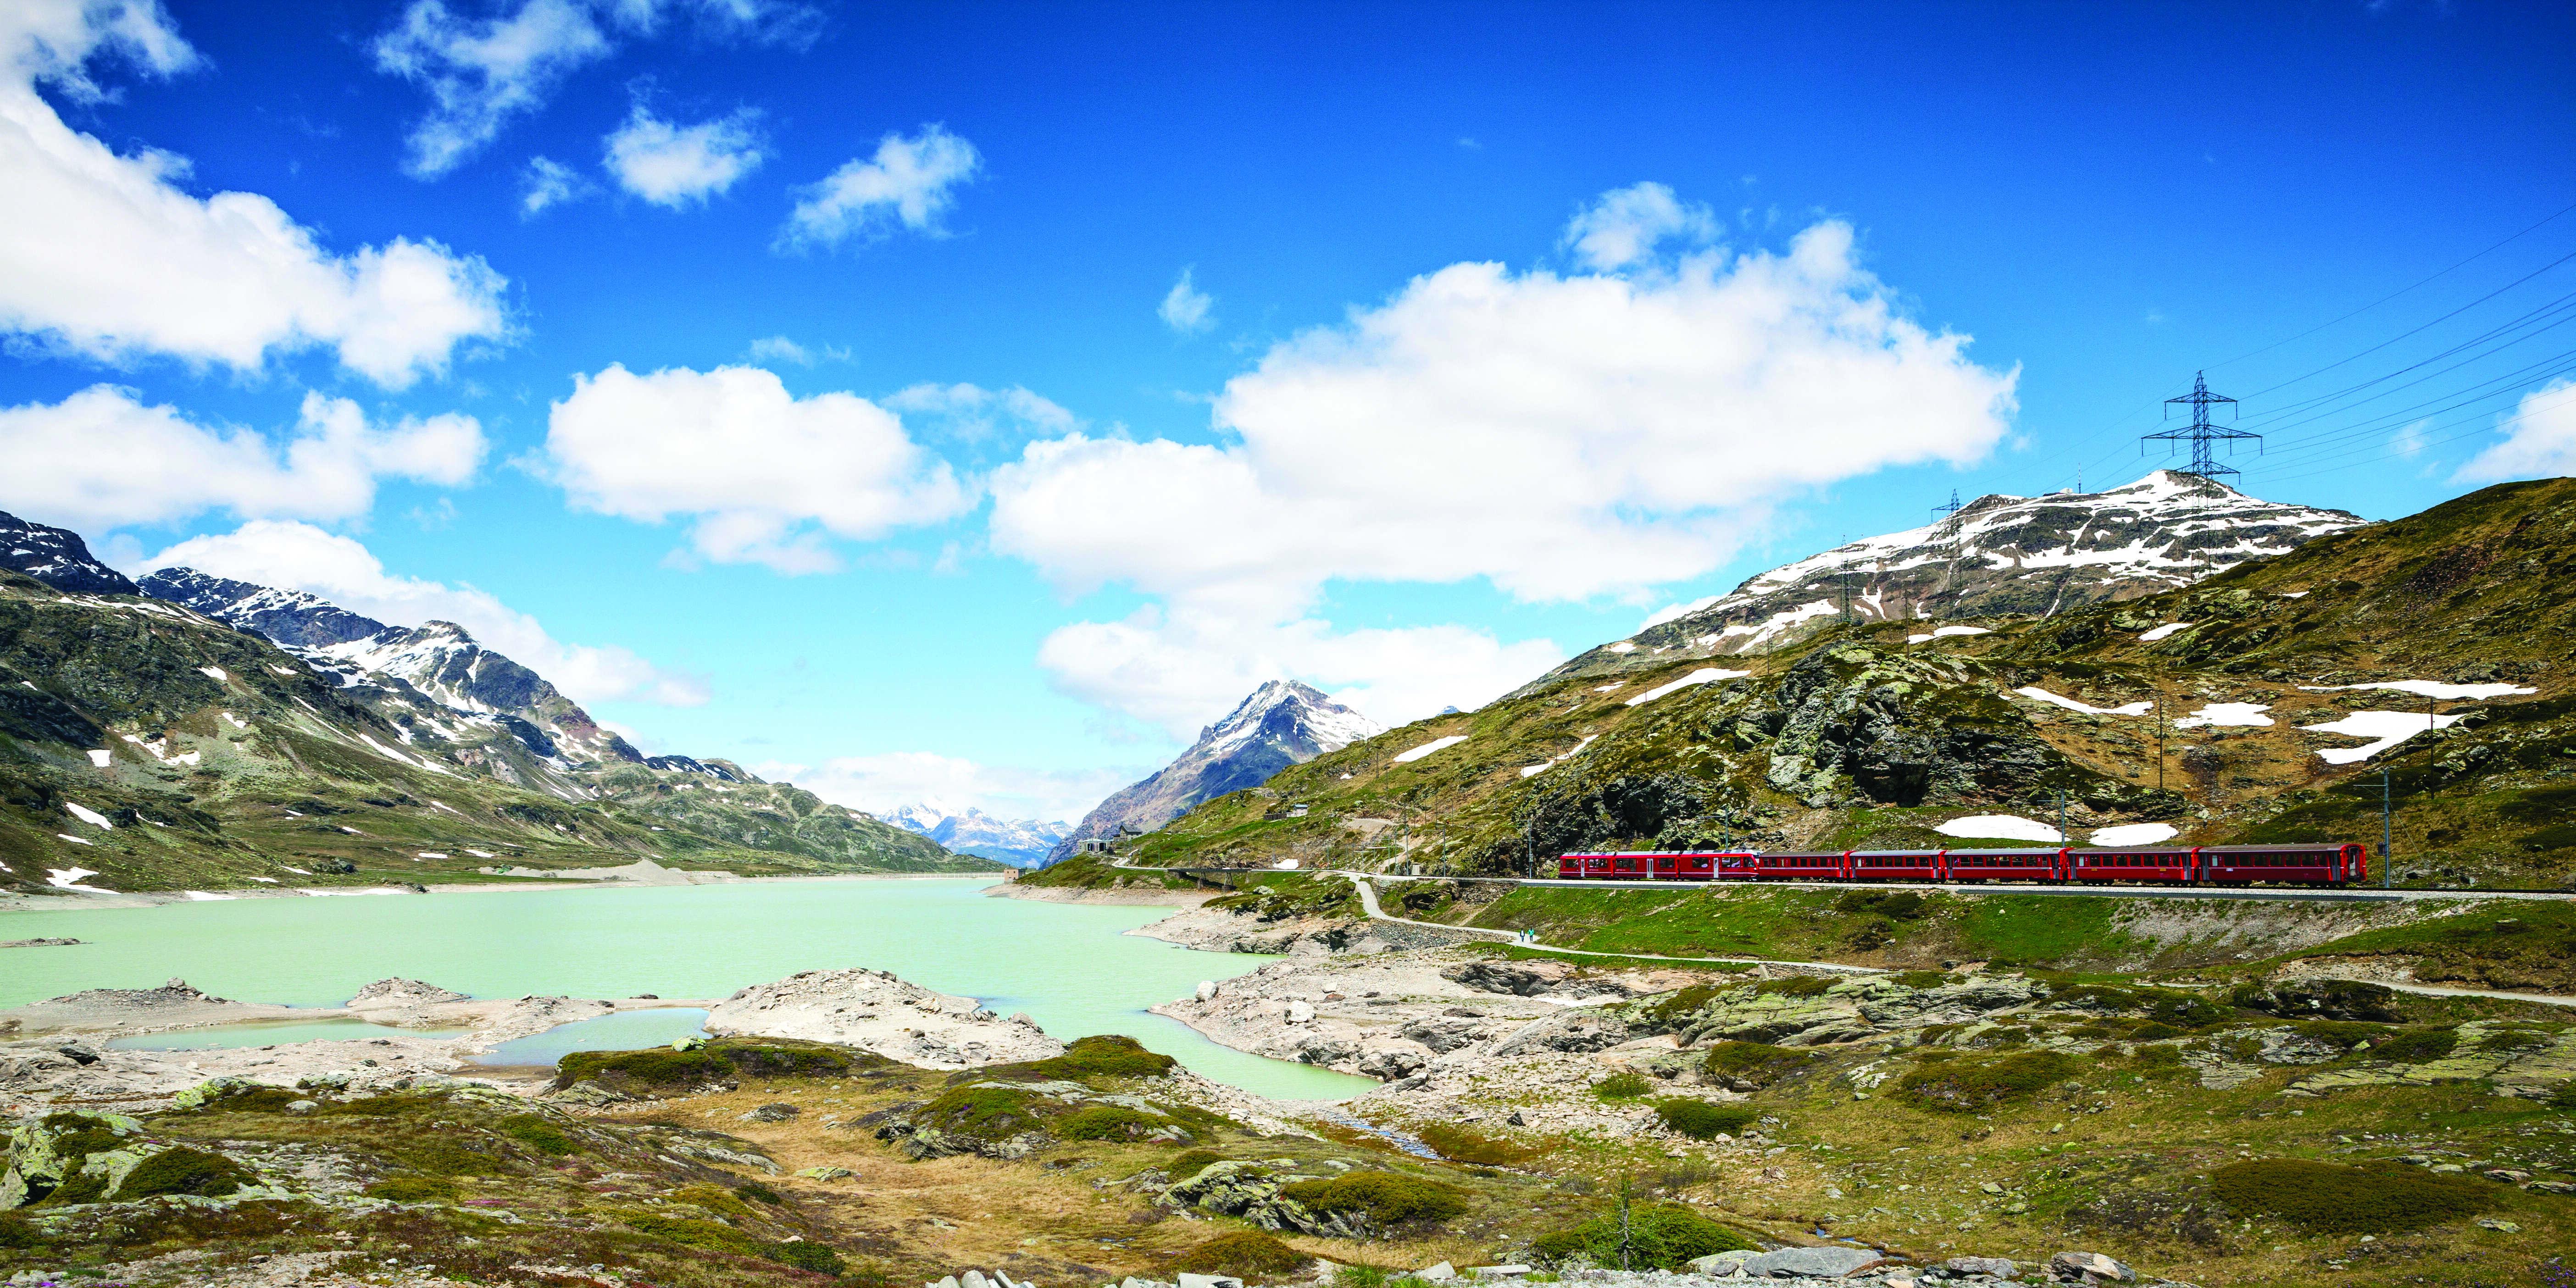 Alpine Lakes & Scenic Trains featuring cruises on Lake Como & Lake Maggiore and scenic trains in Switzerland & Italy